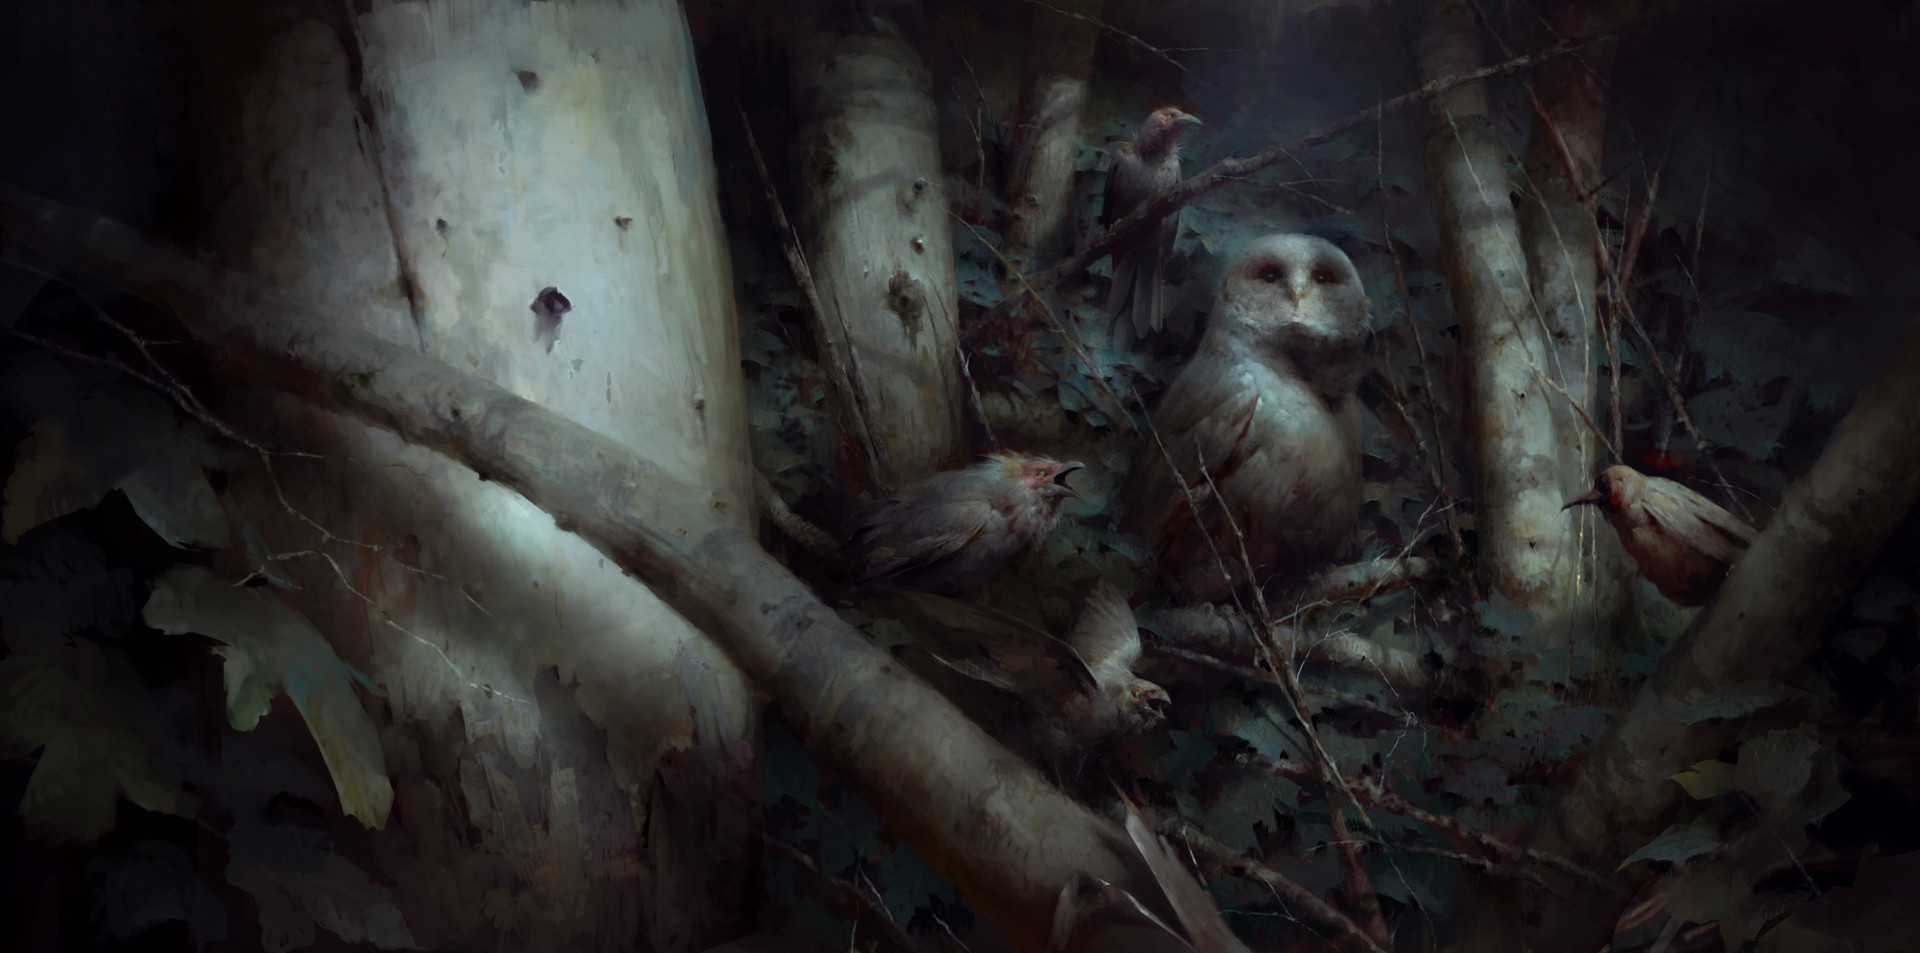 Piotr jablonski serkonan night birds with owl 2s